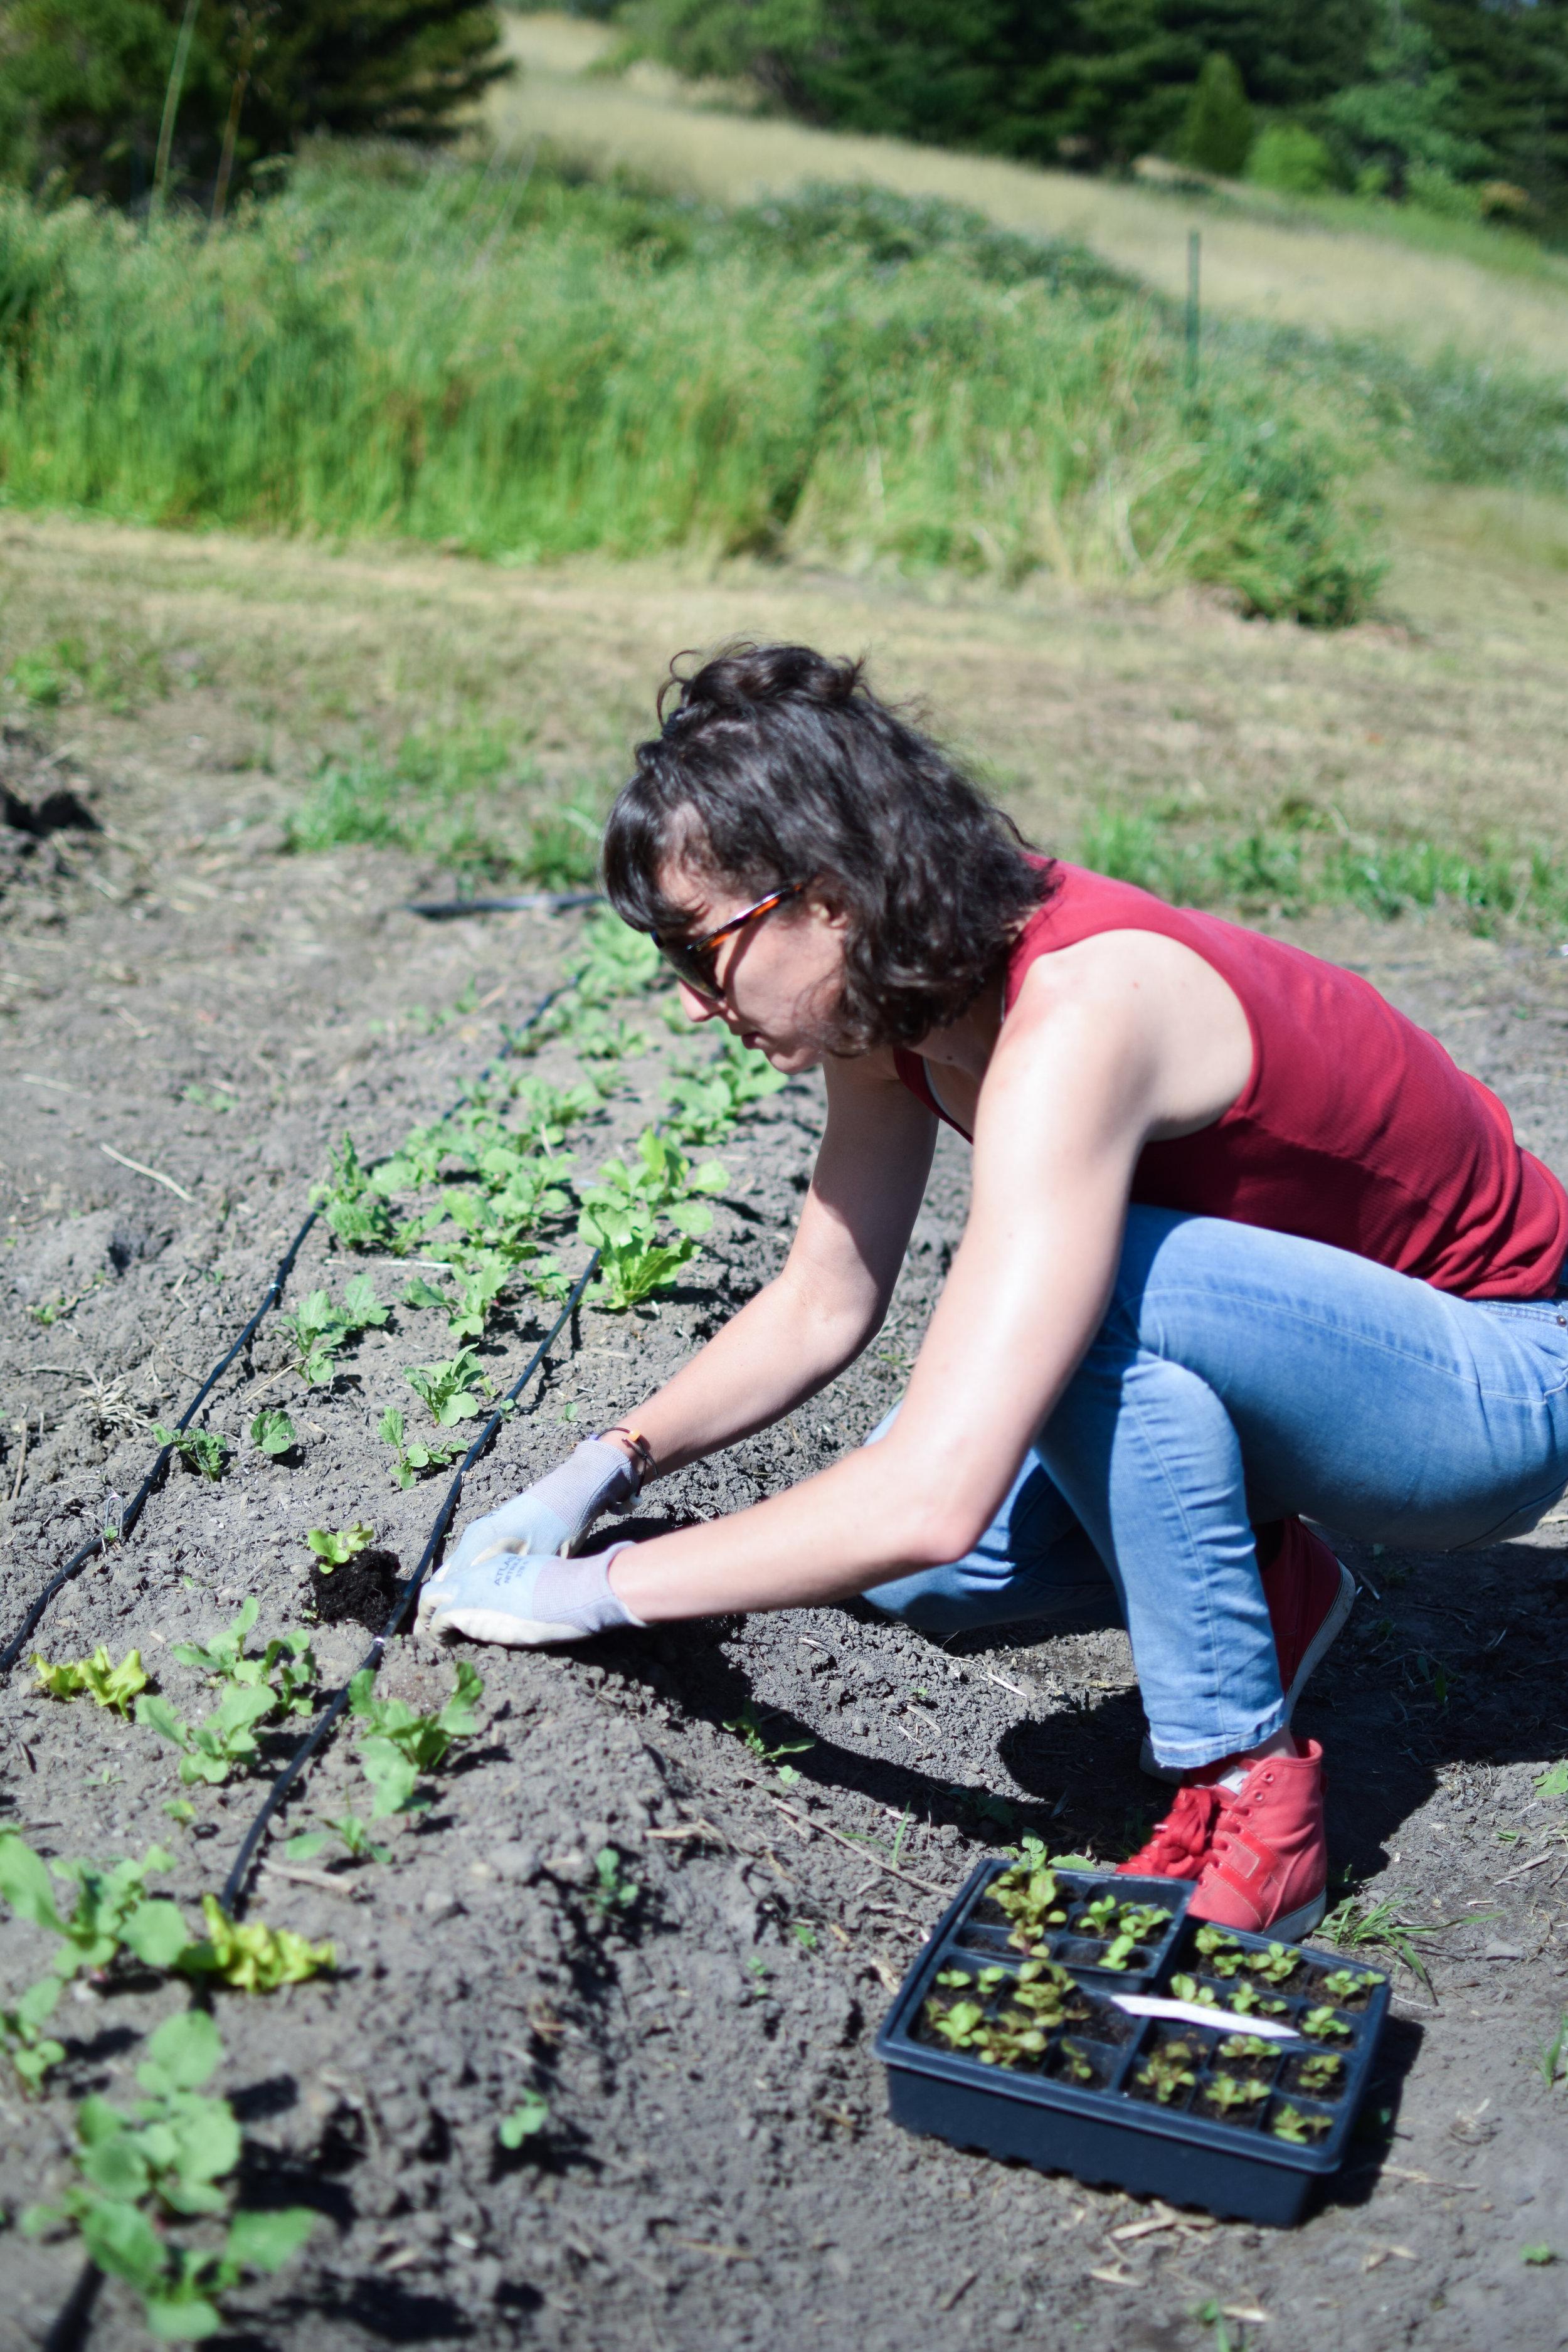 Elana transplanting lettuces